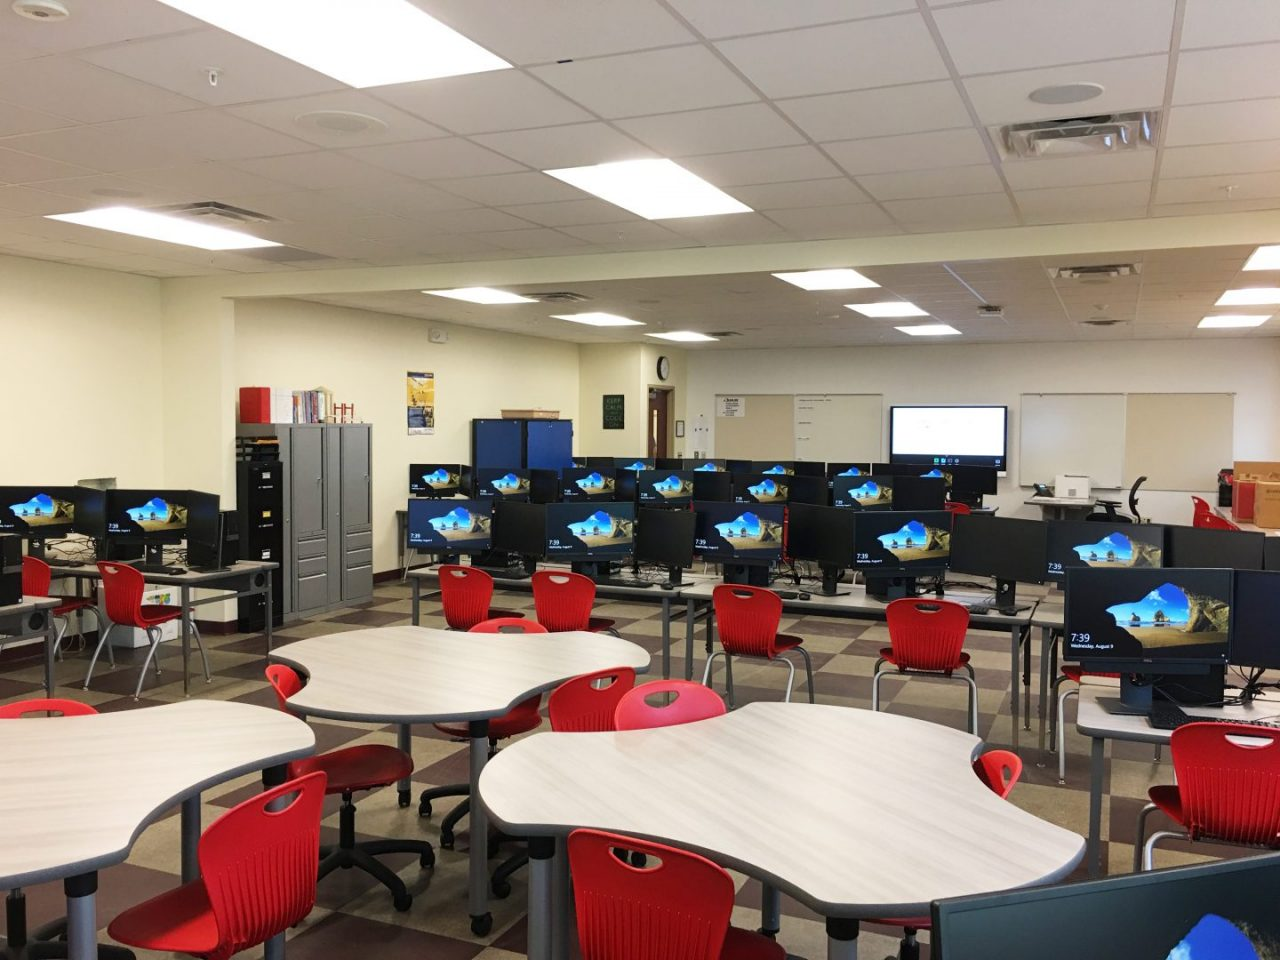 classroom - photo #17